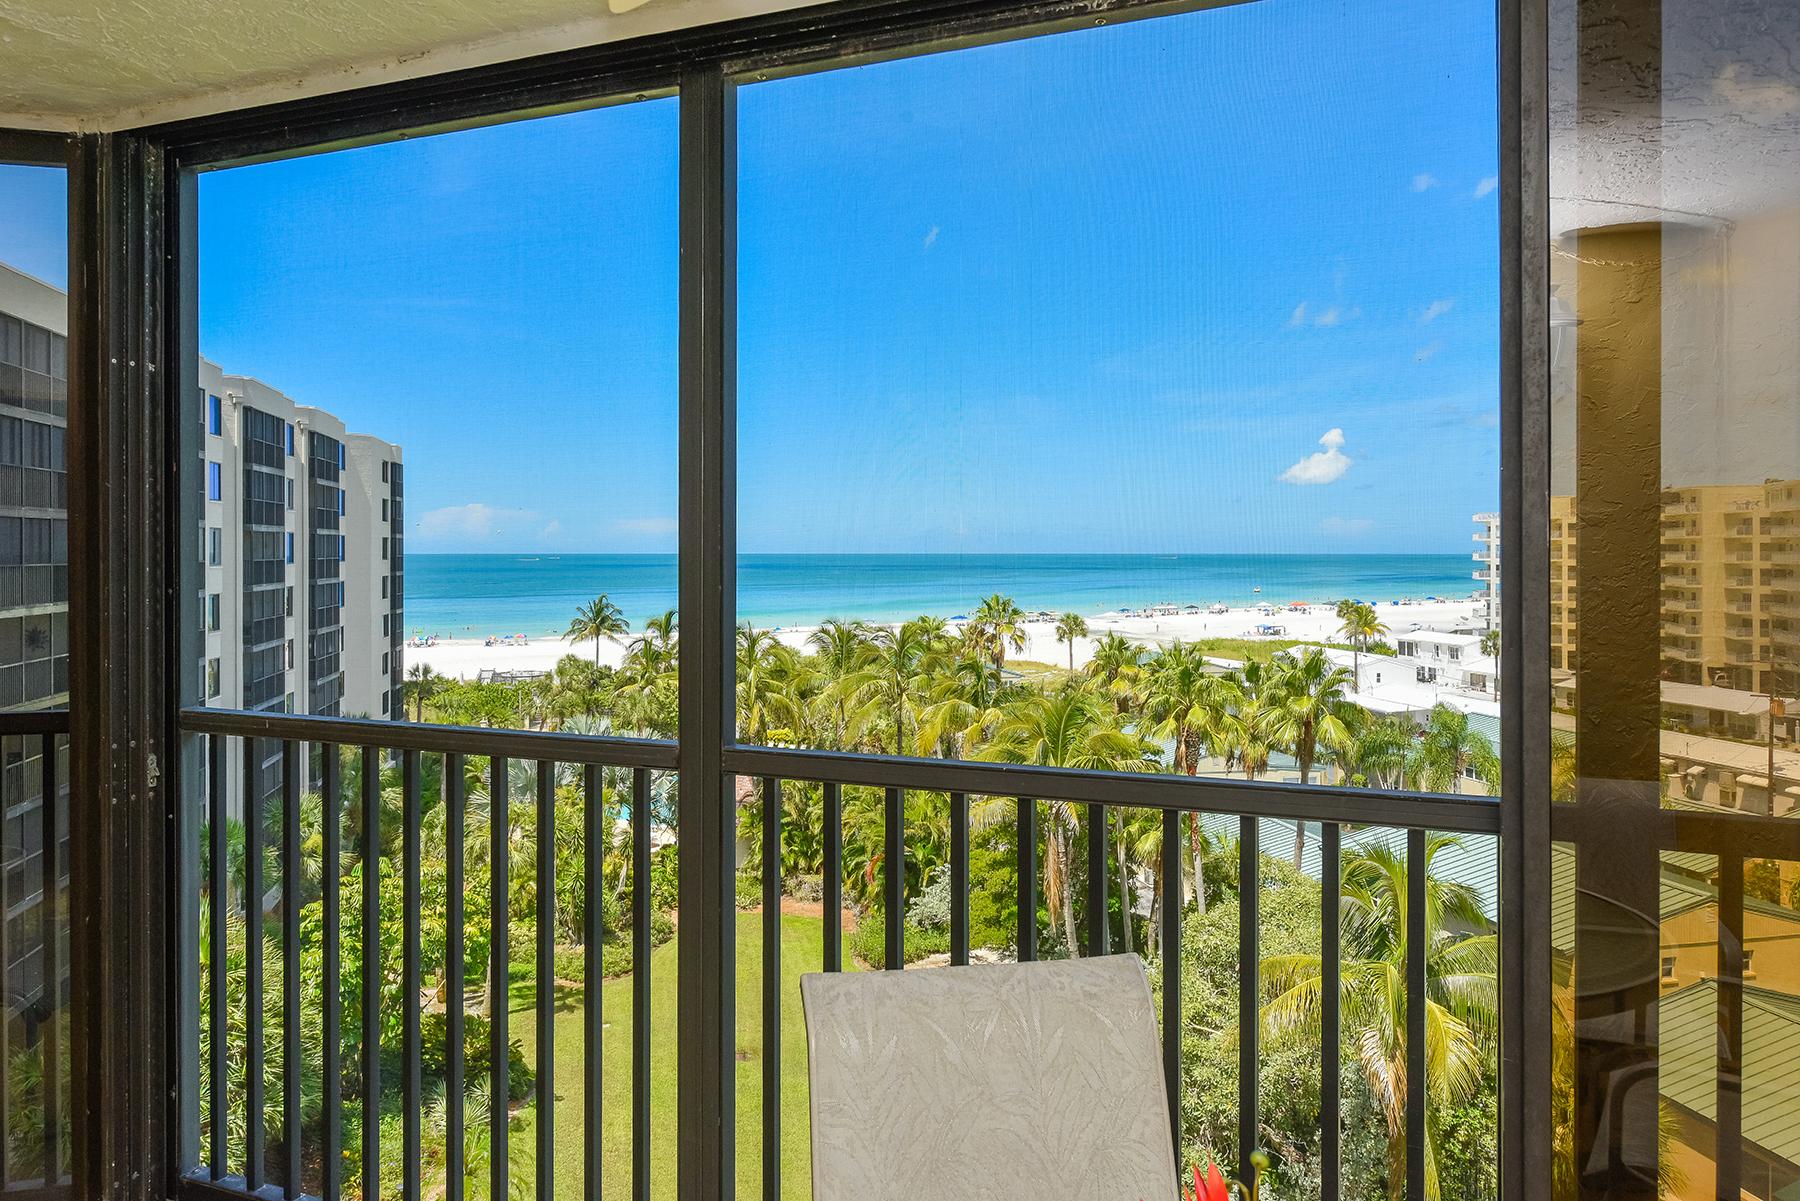 Condominium for Sale at CASARINA 5880 Midnight Pass Rd 710 Sarasota, Florida, 34242 United States